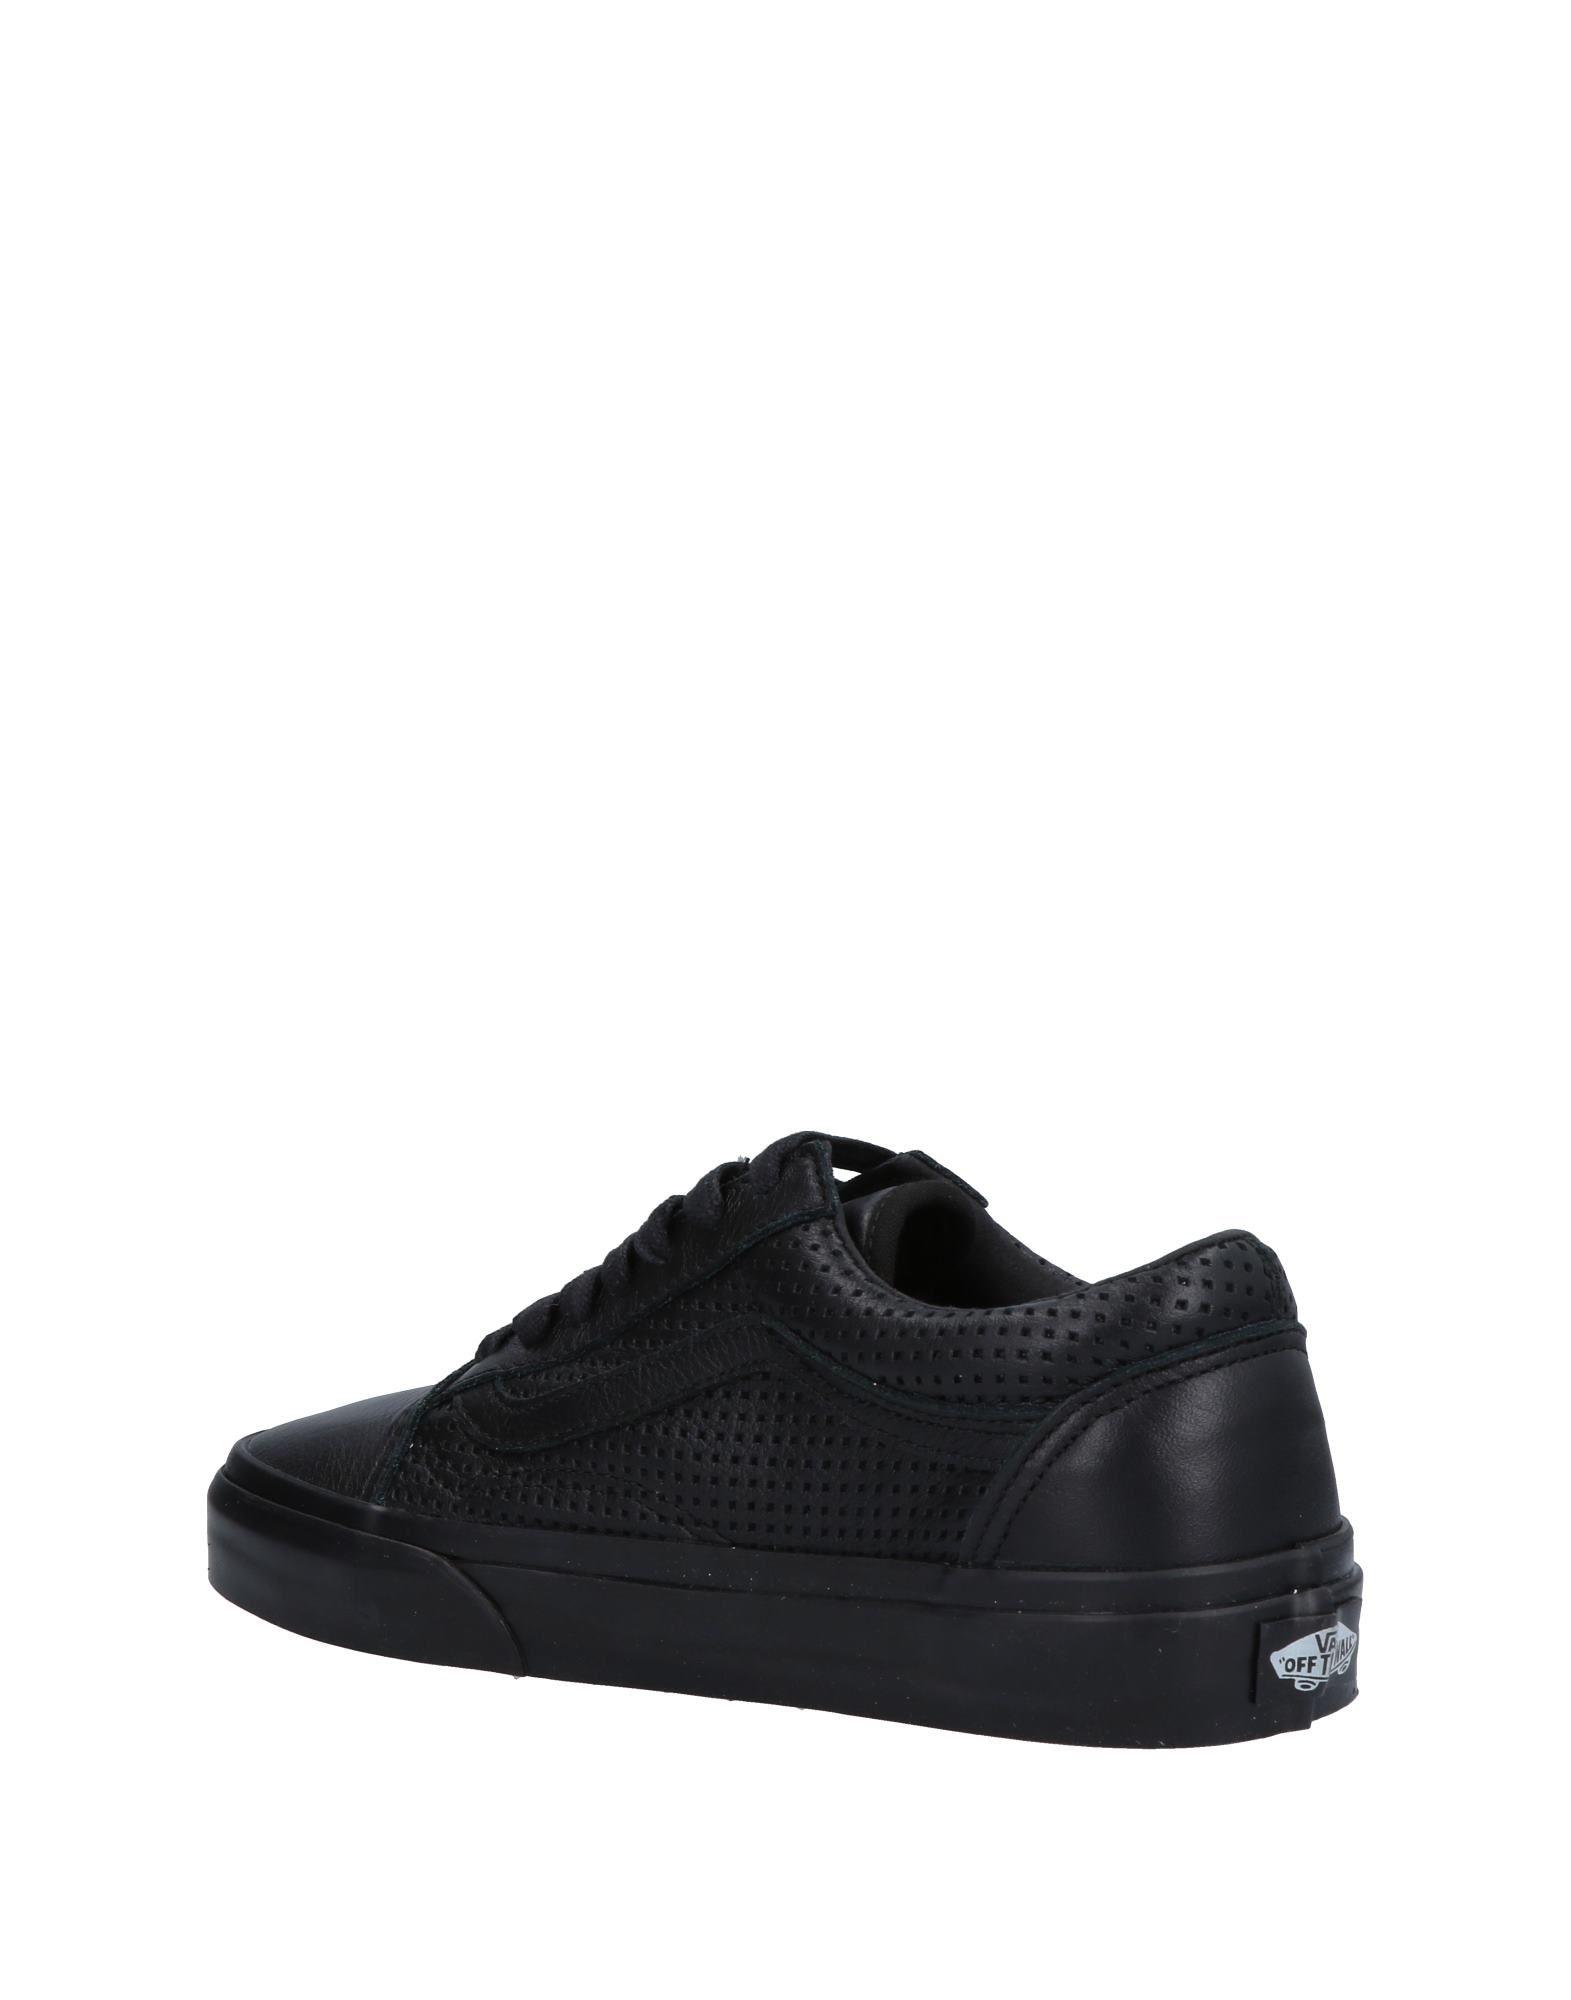 Stilvolle billige billige billige Schuhe Vans Sneakers Damen  11484259JG cc6ae6